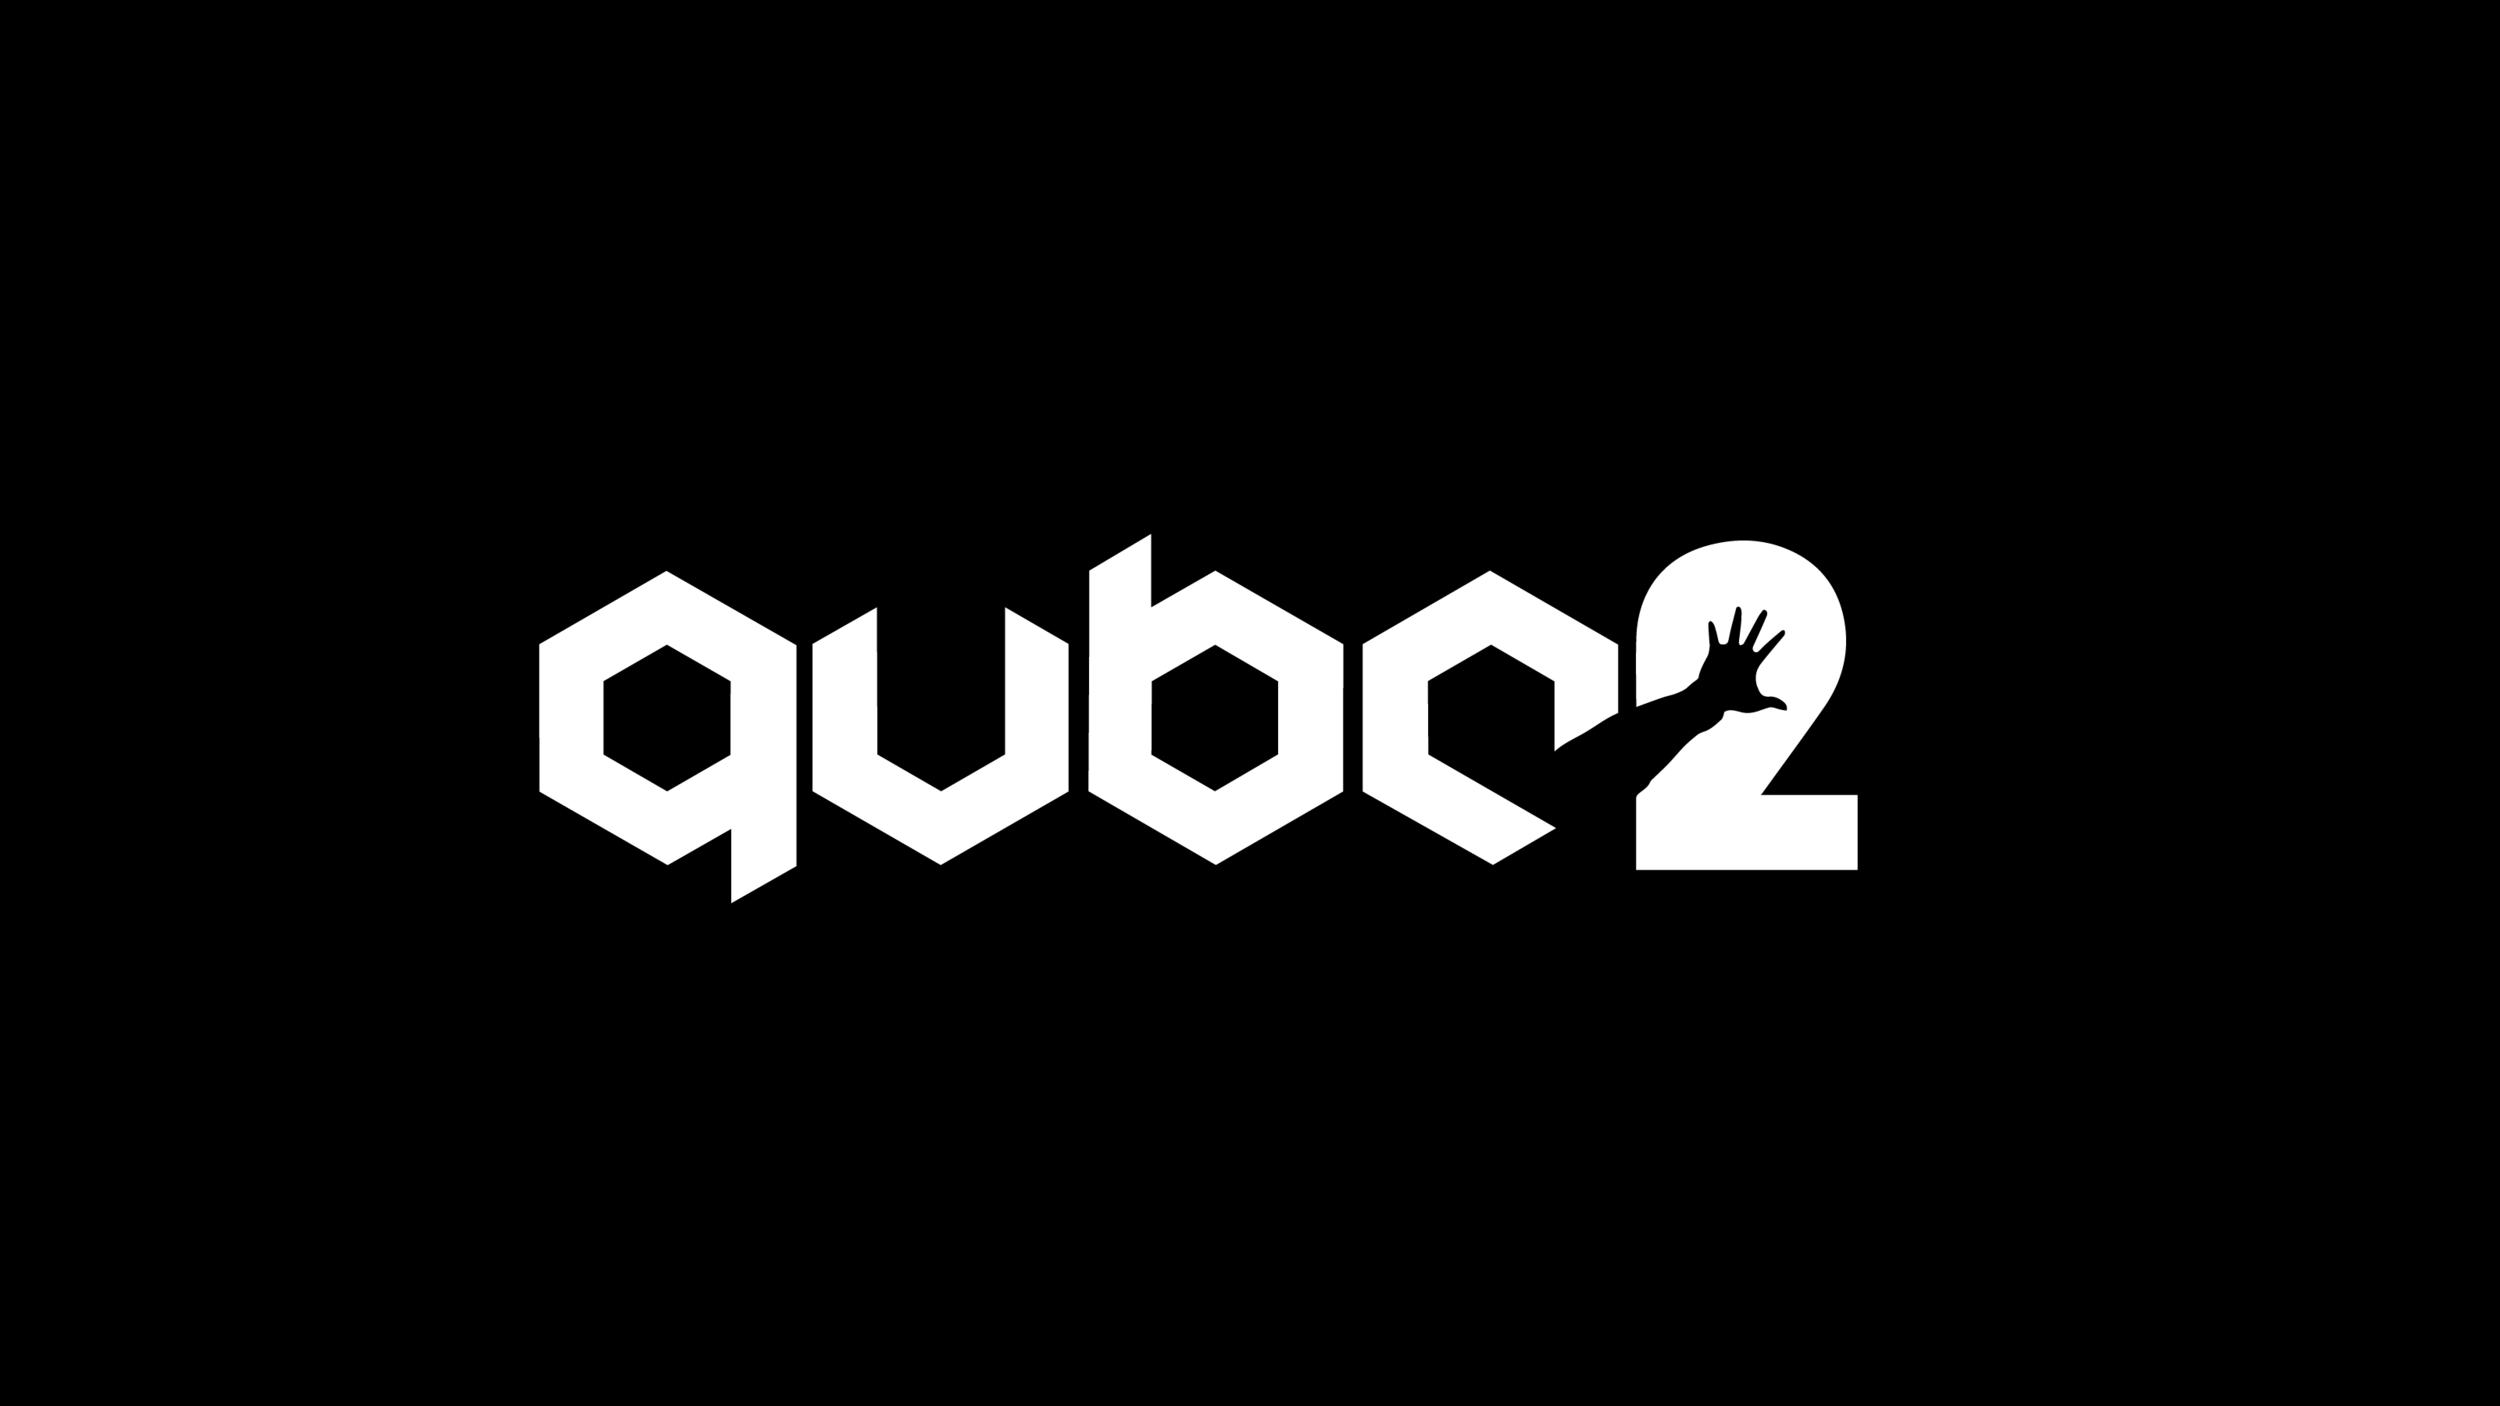 QUBE 2 Dark.png